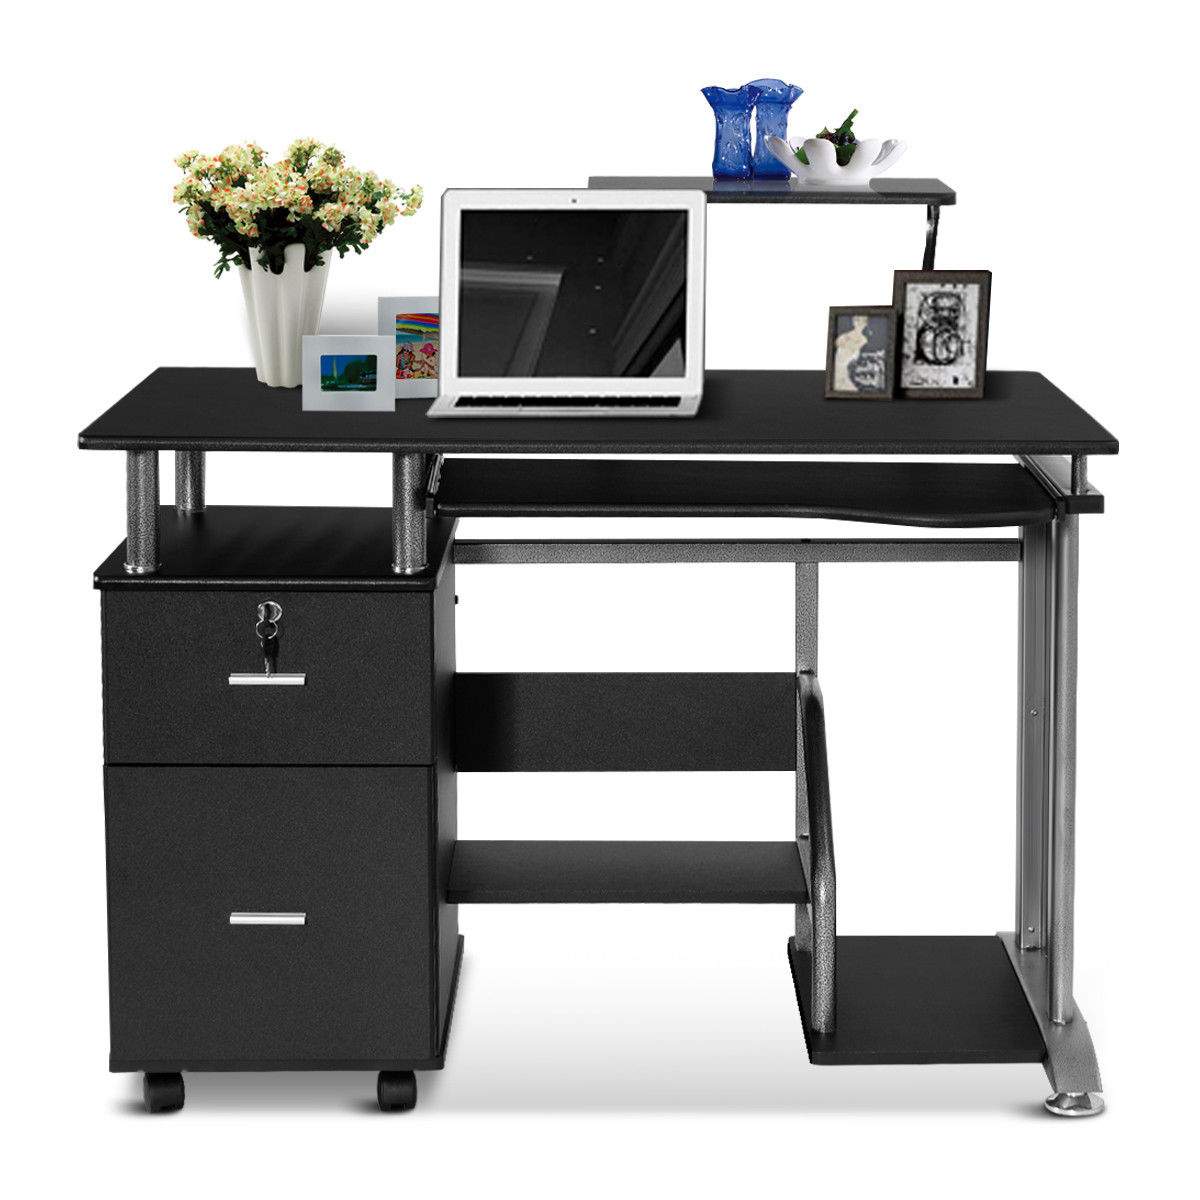 Costway computer desk pc laptop table workstation home office furniture w printer shelf walmart com